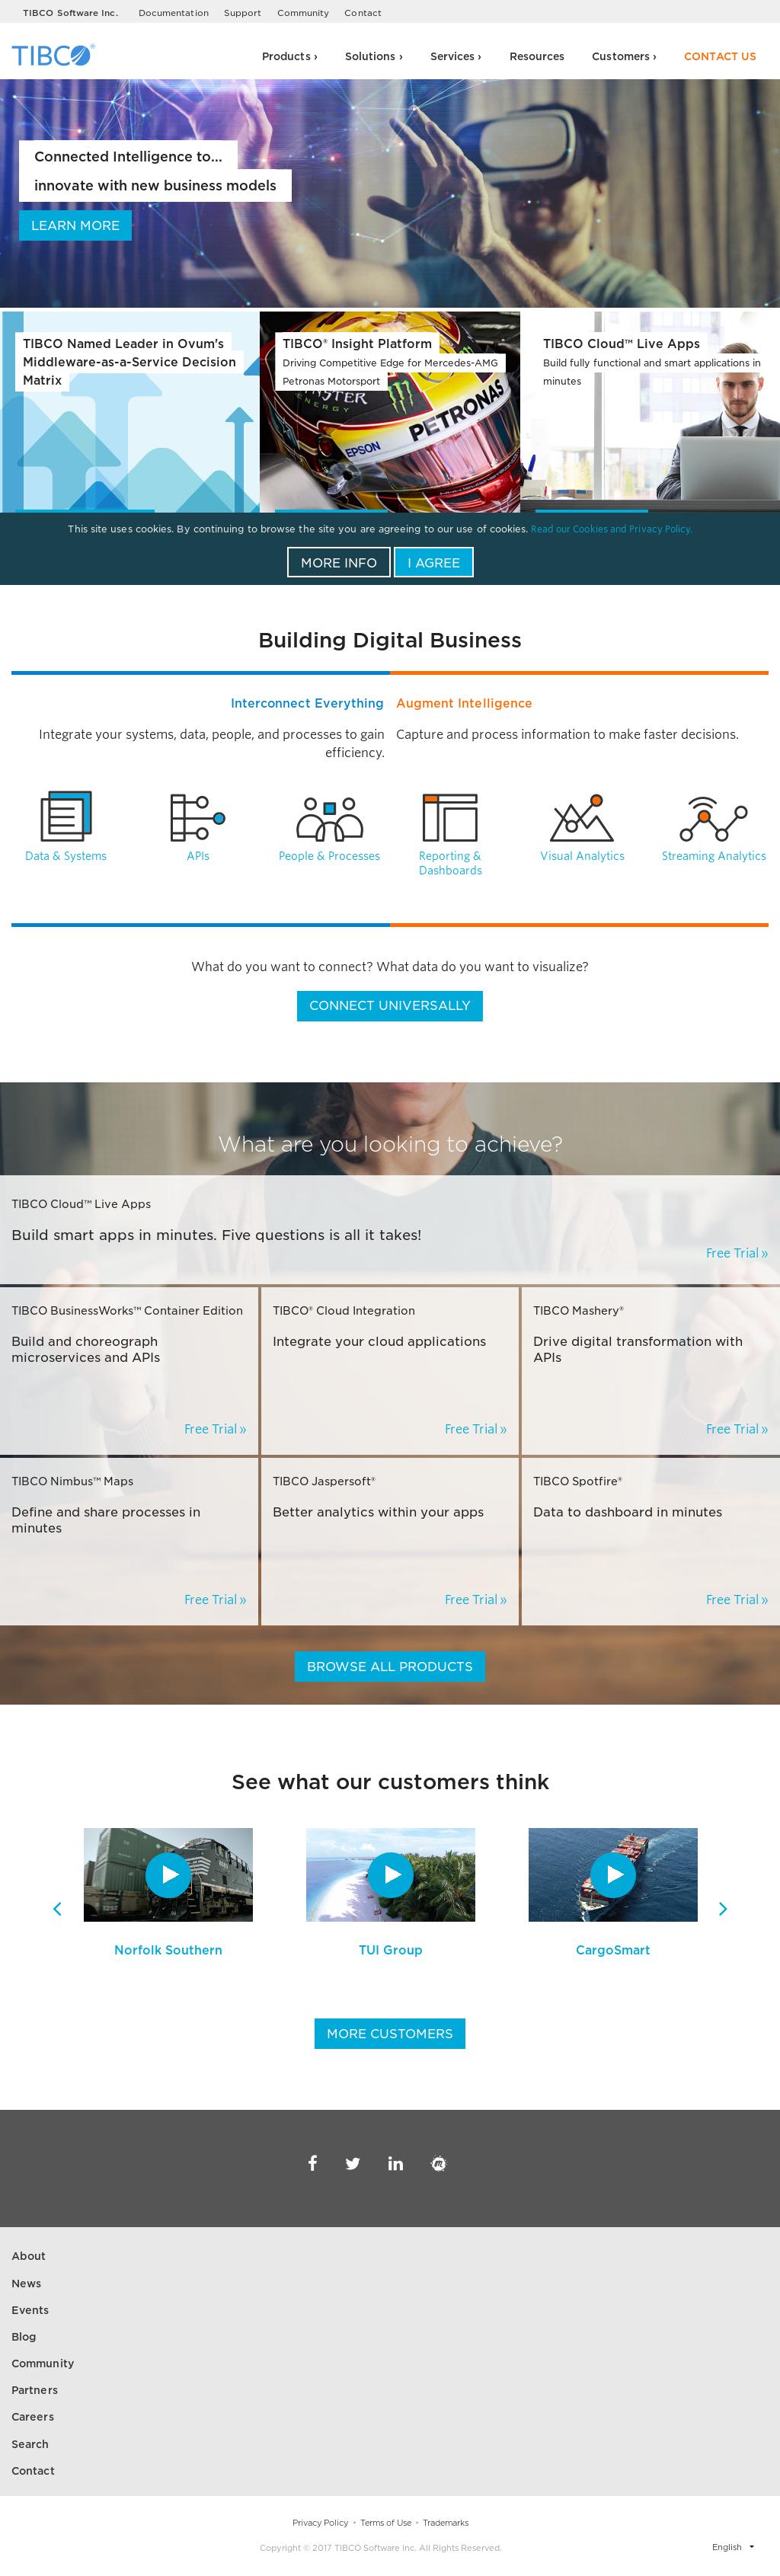 TIBCO Competitors, Revenue and Employees - Owler Company Profile